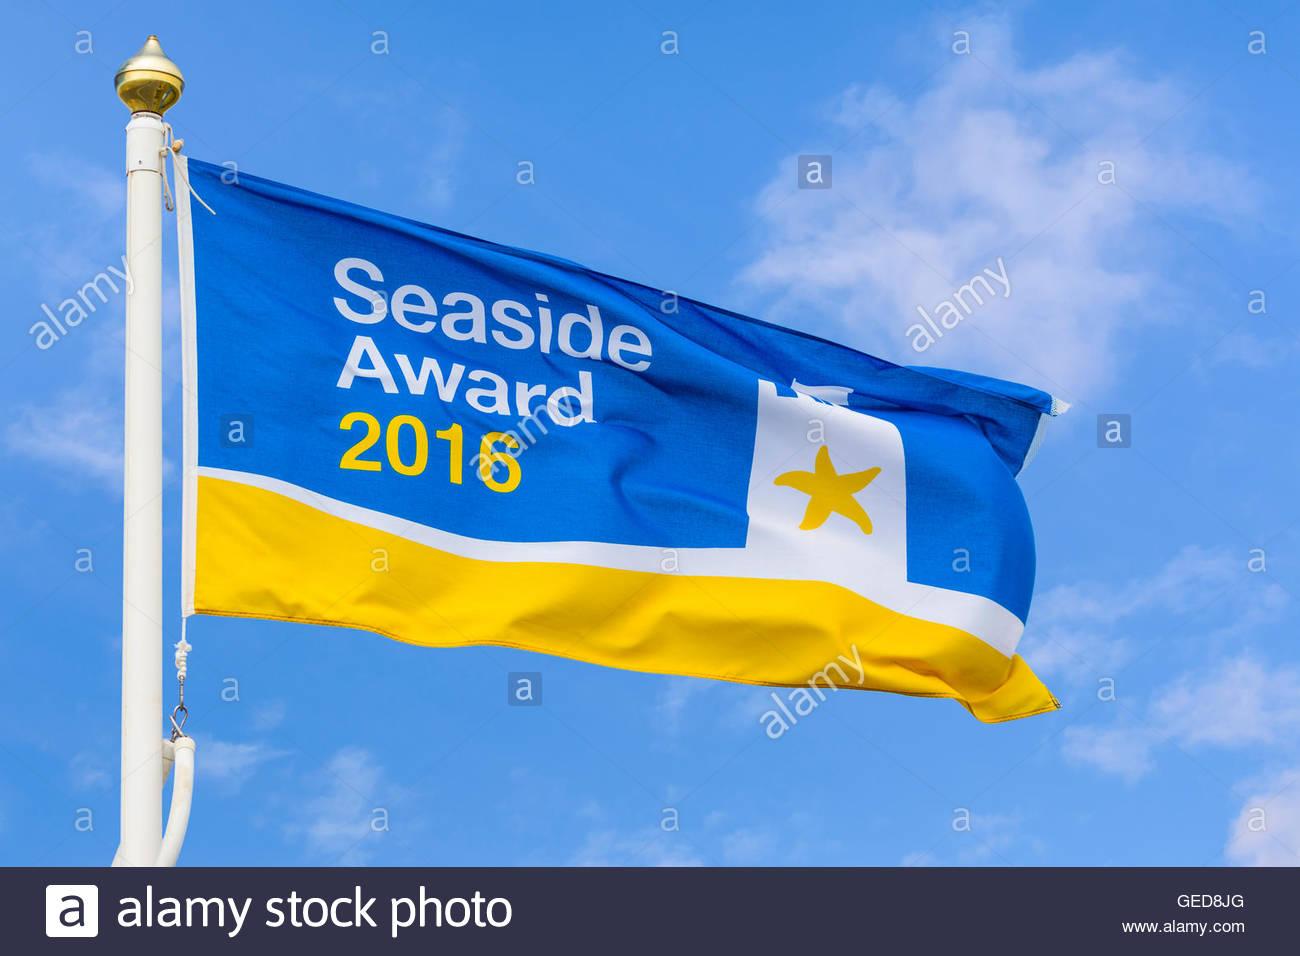 Seaside Award 2016 flag flying against blue sky in Littlehampton, West Sussex, England, UK. - Stock Image